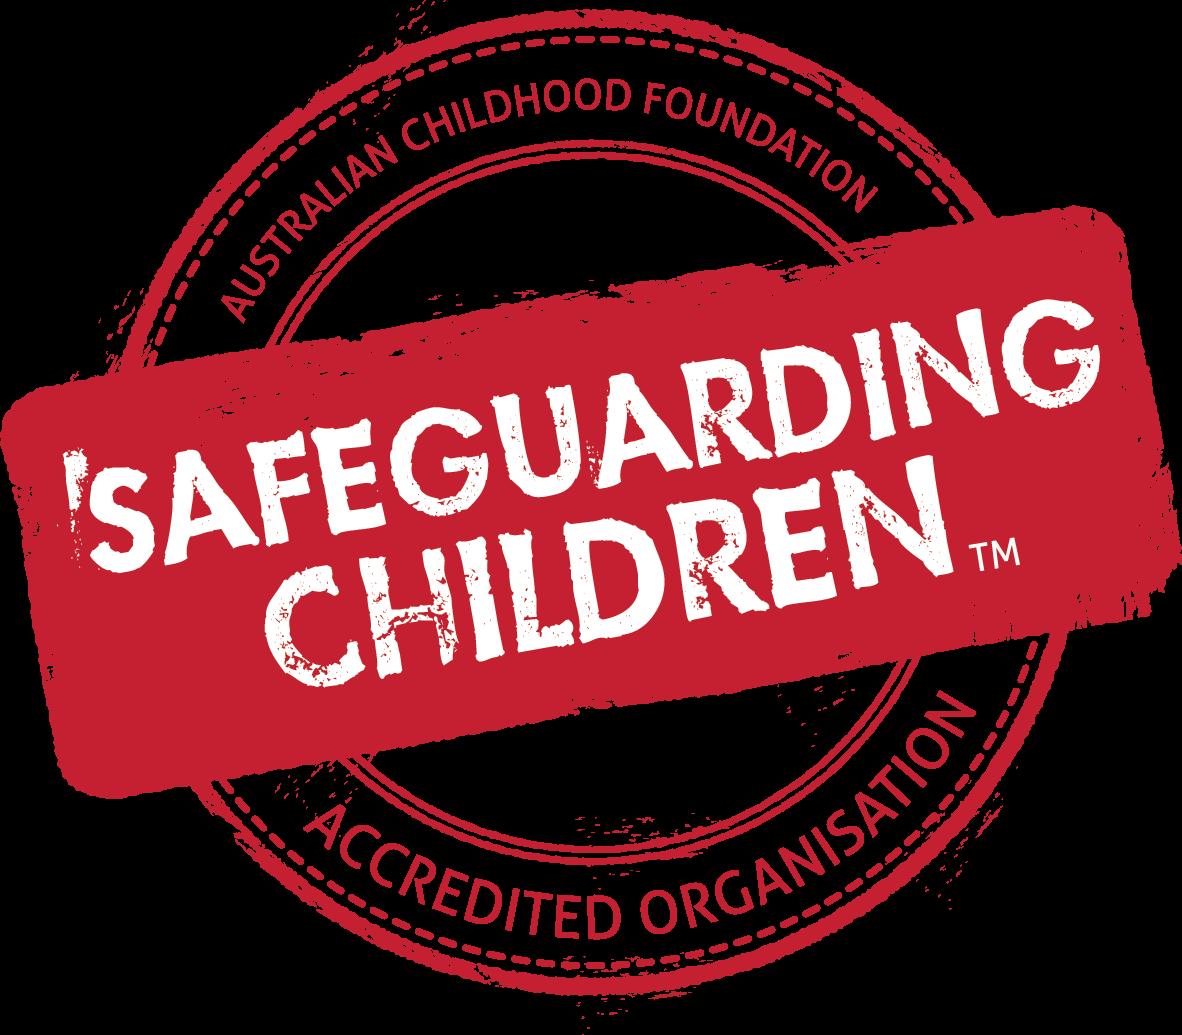 Safeguard_children_red logo 200px border